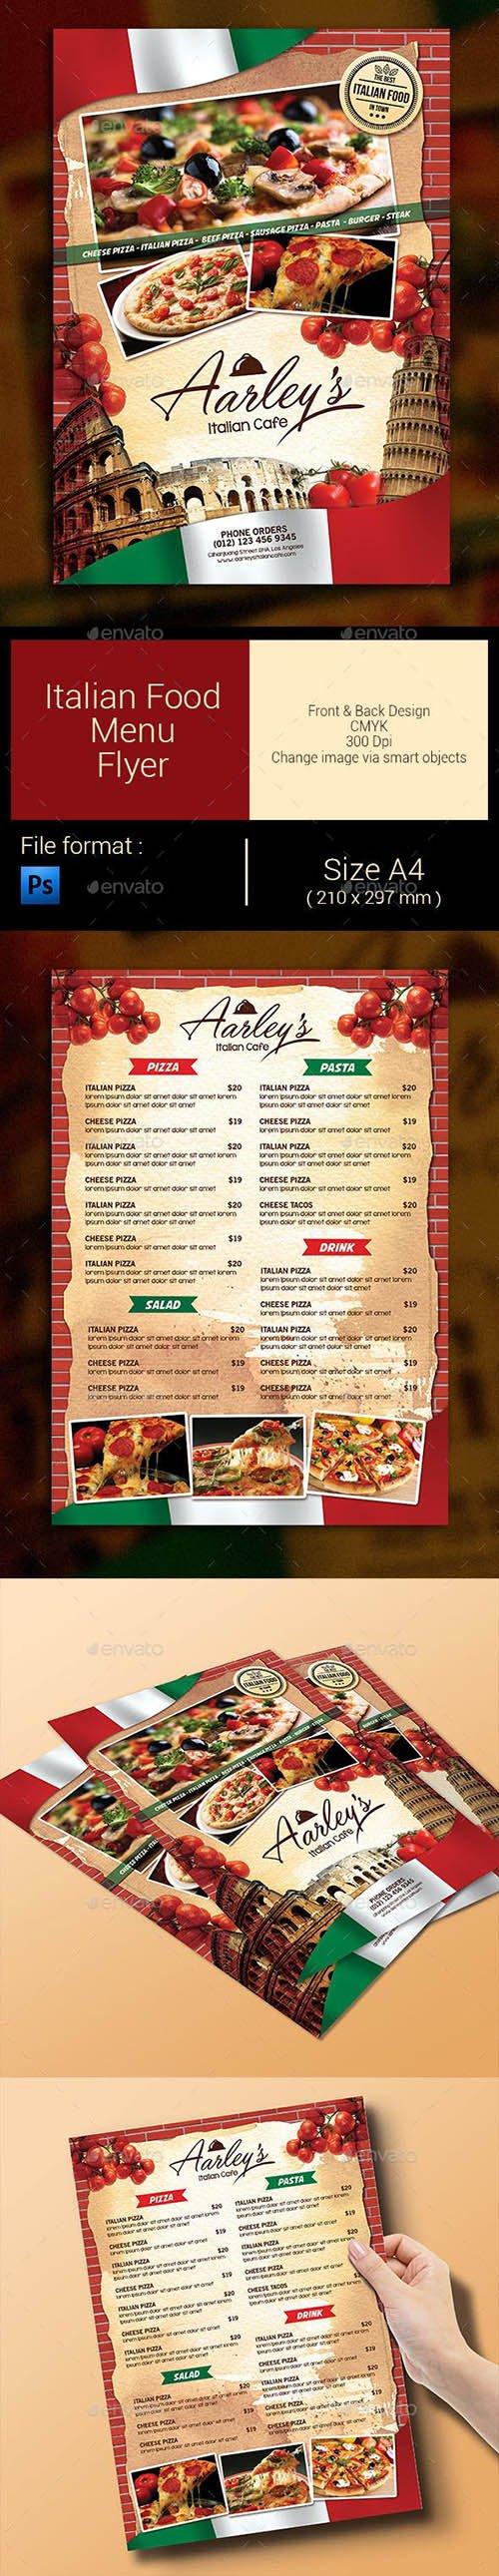 GR - Italian Food Menu Flyer 9267264